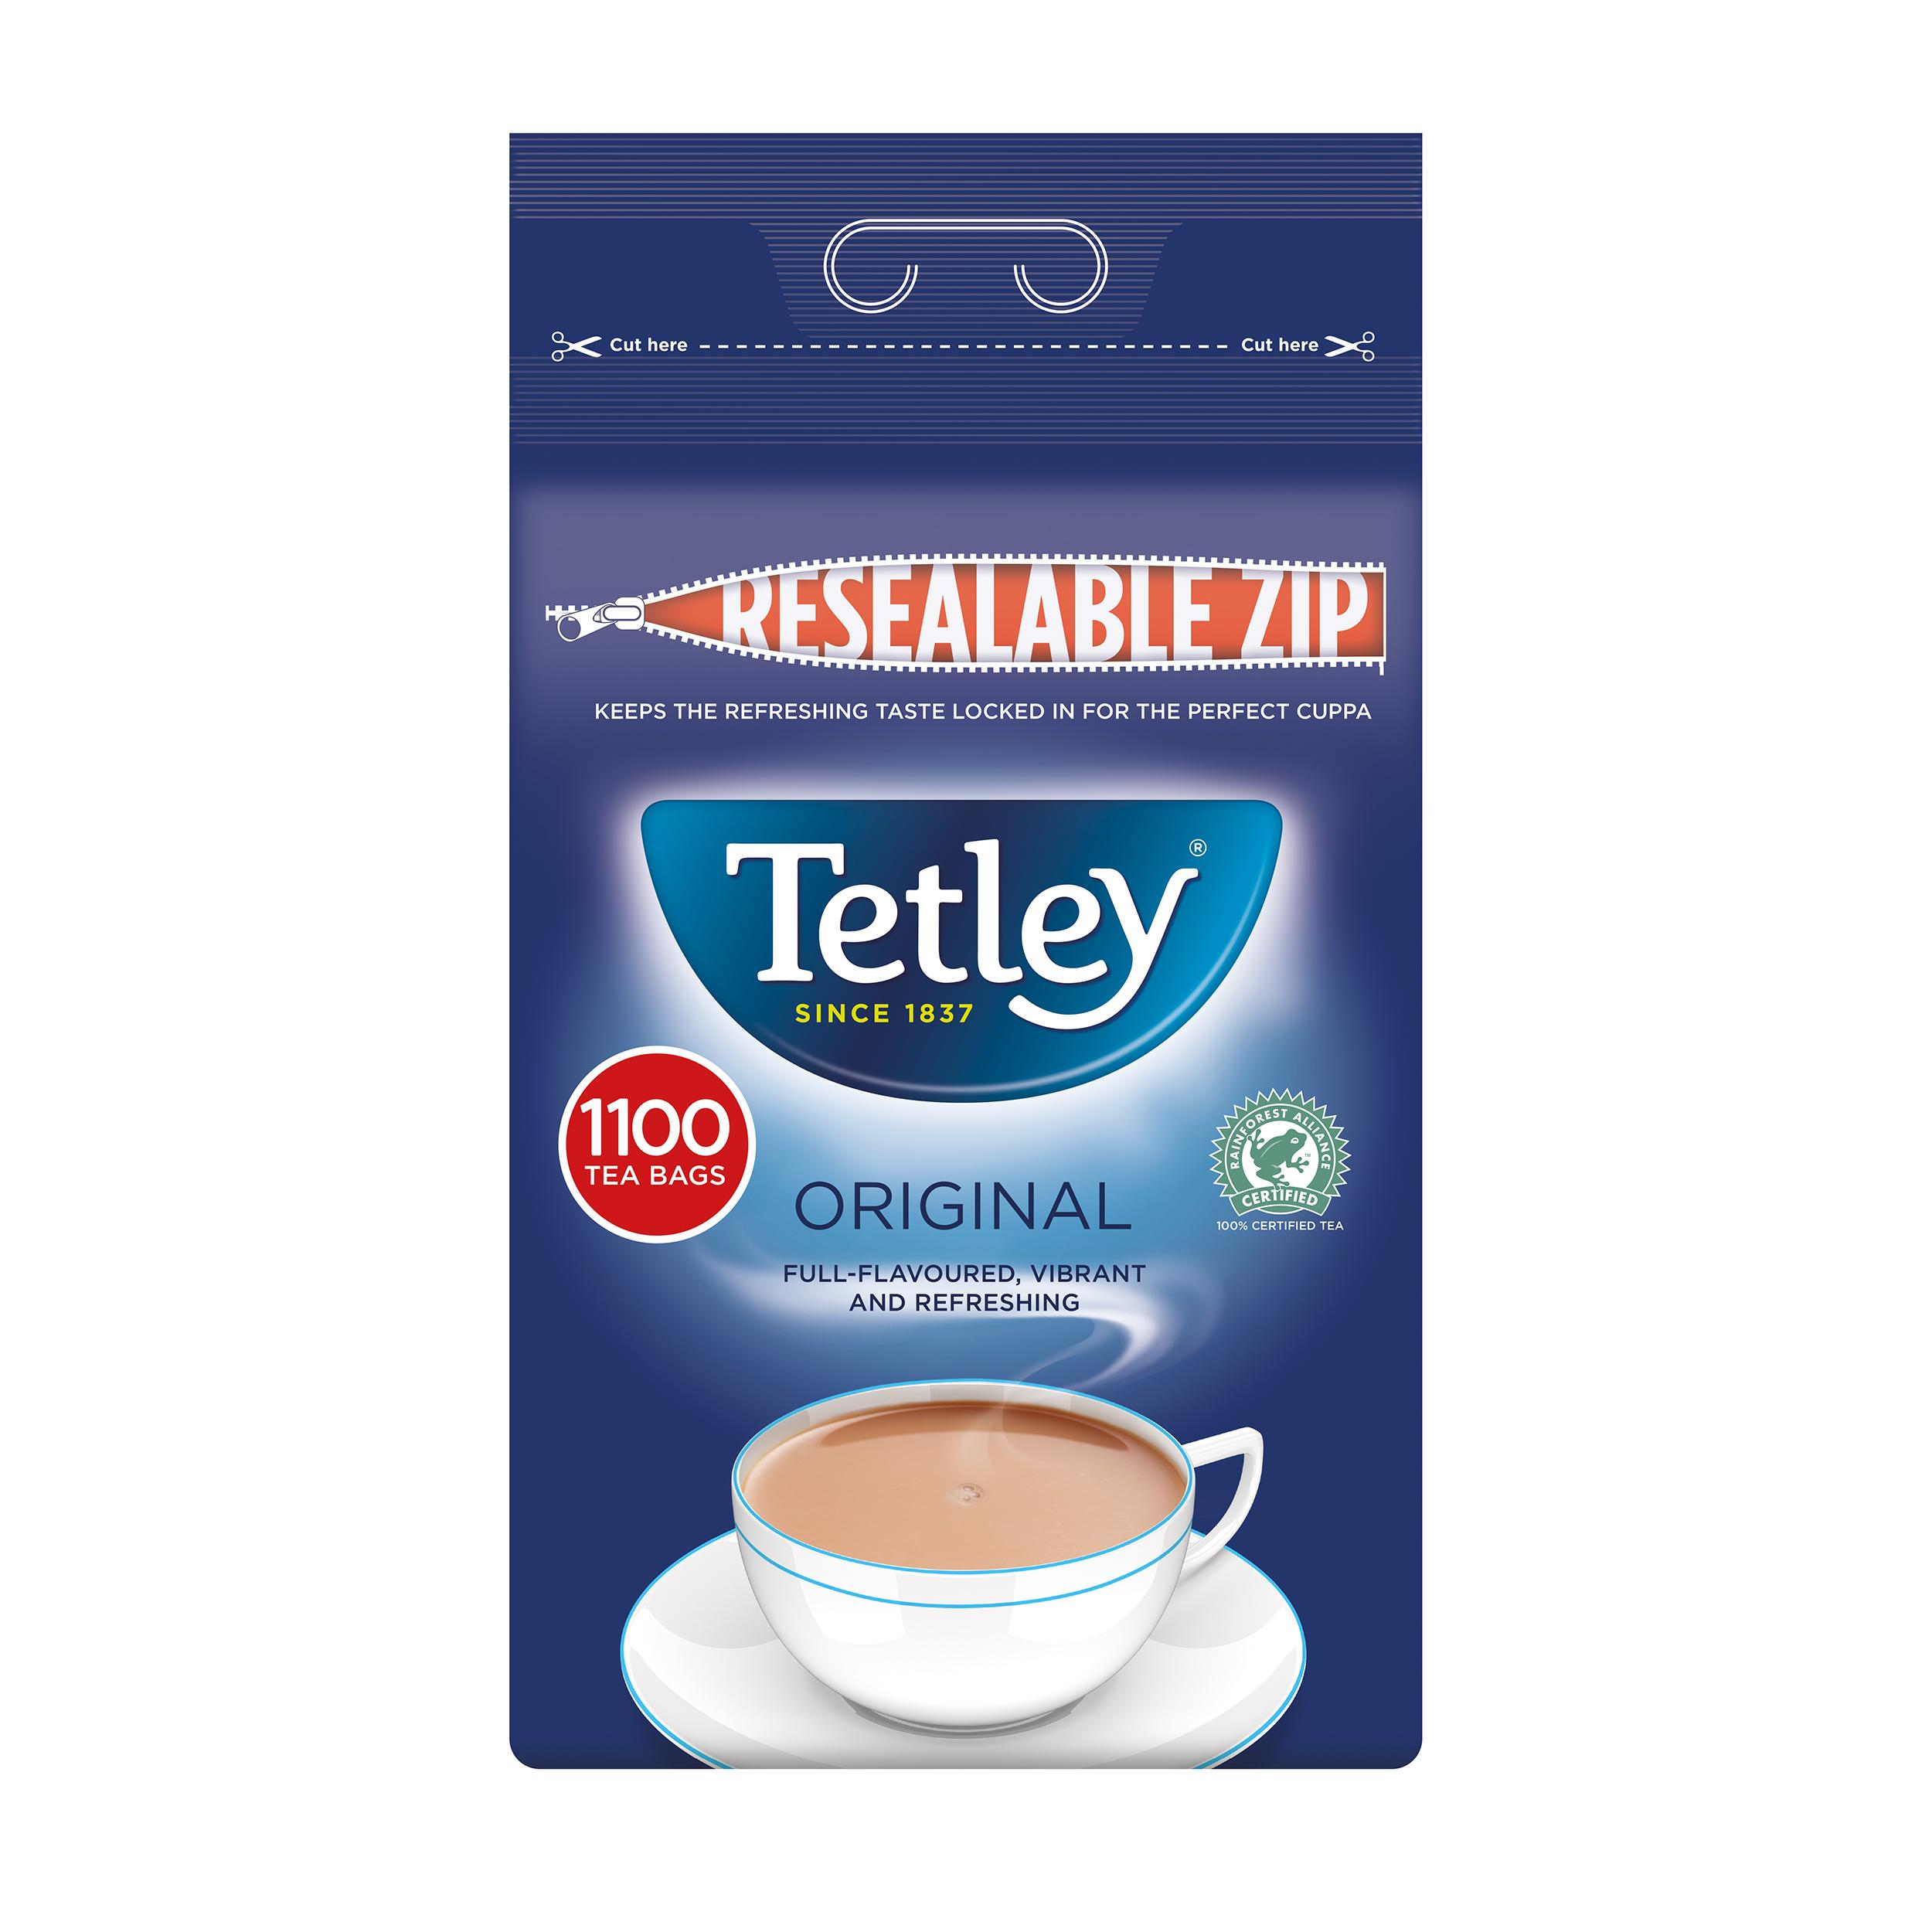 Tetley 1100 One Cup Teabags